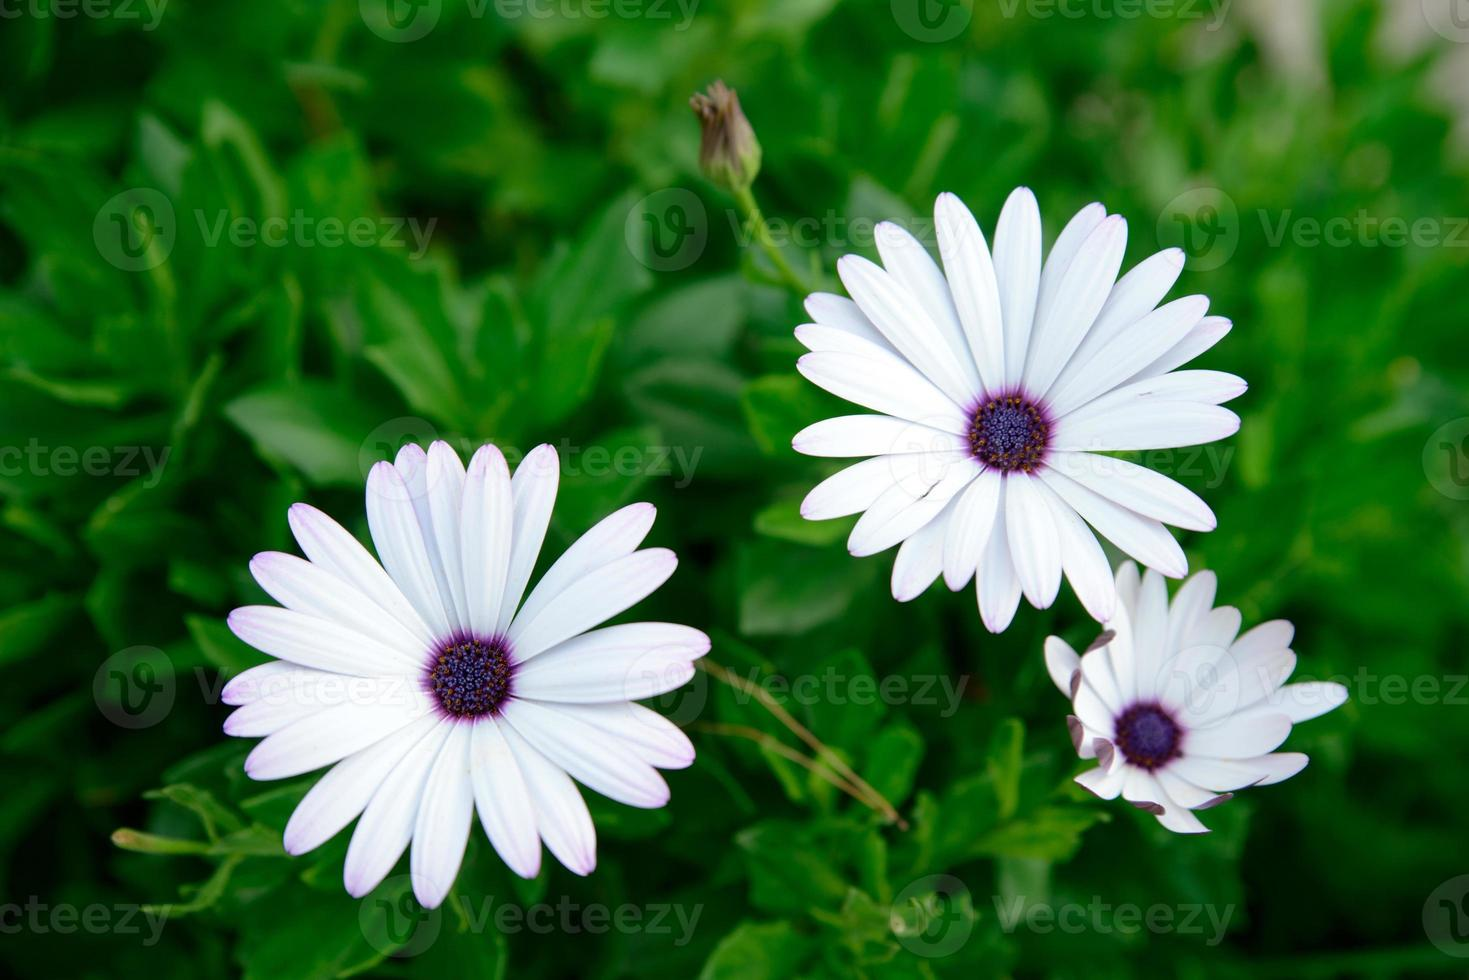 vita blommor närbild foto